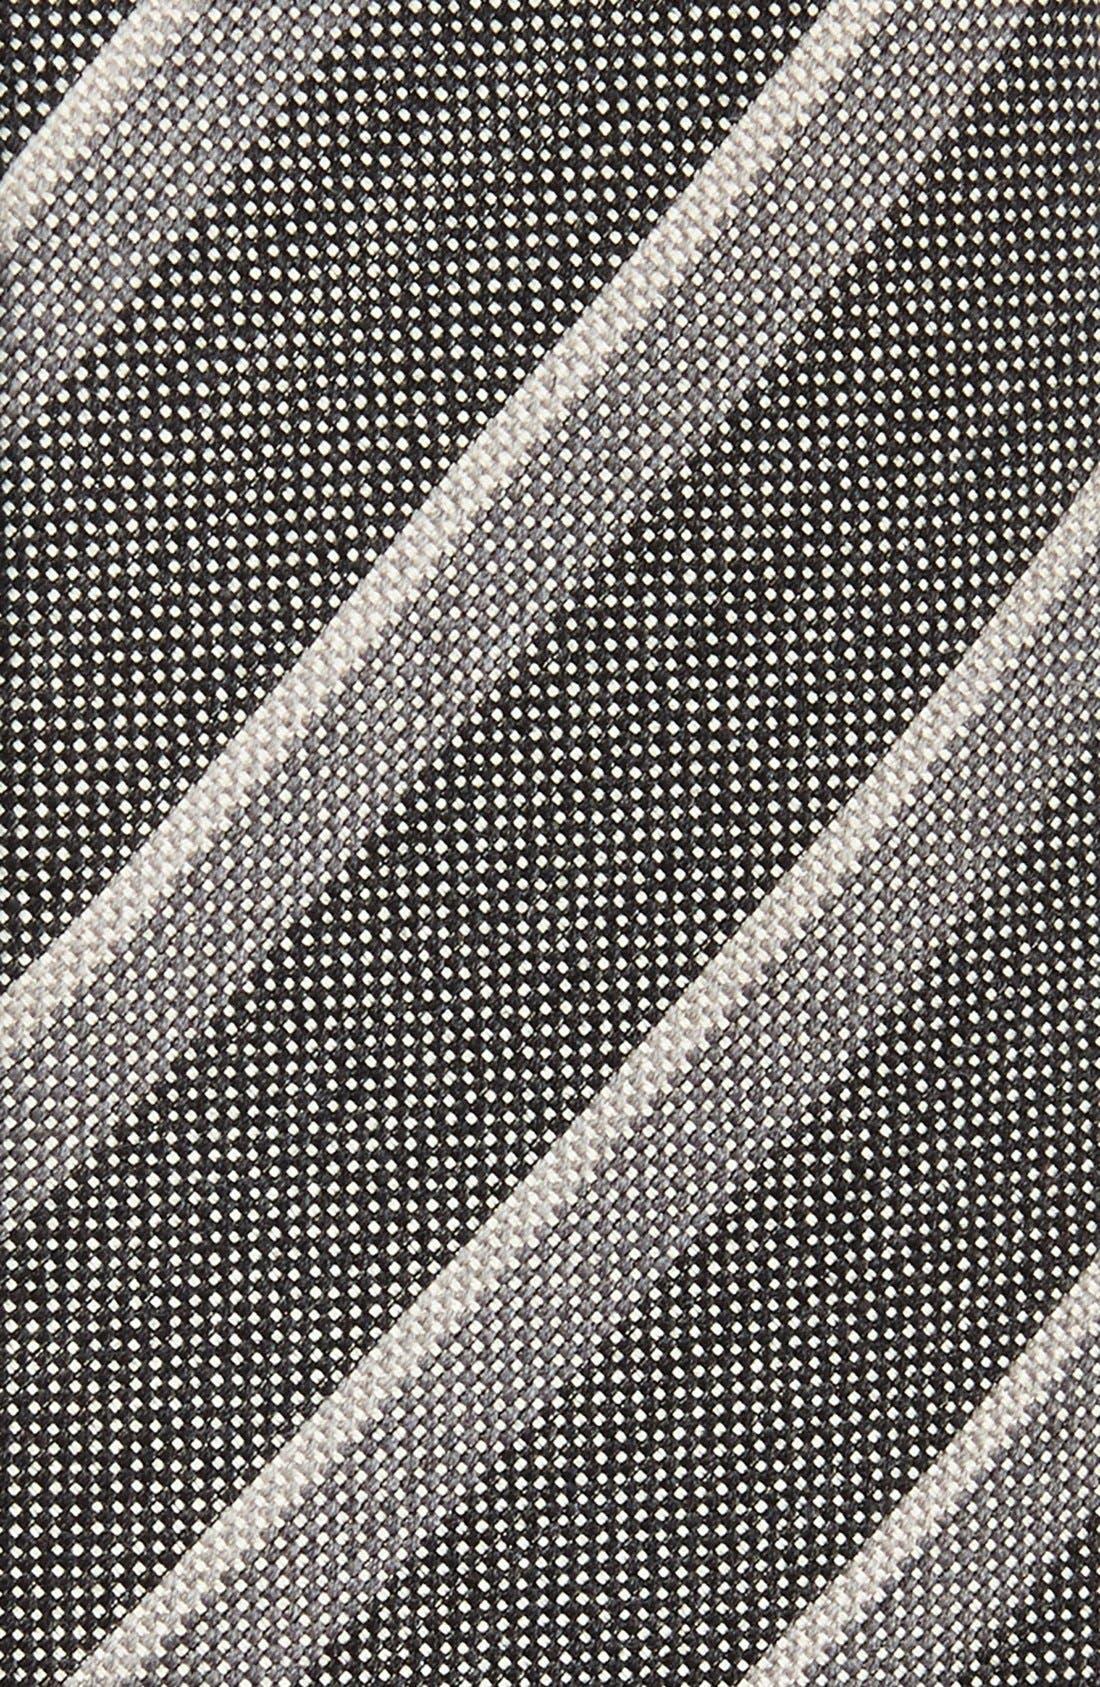 Alternate Image 2  - John Varvatos Collection Woven Cotton Blend Tie